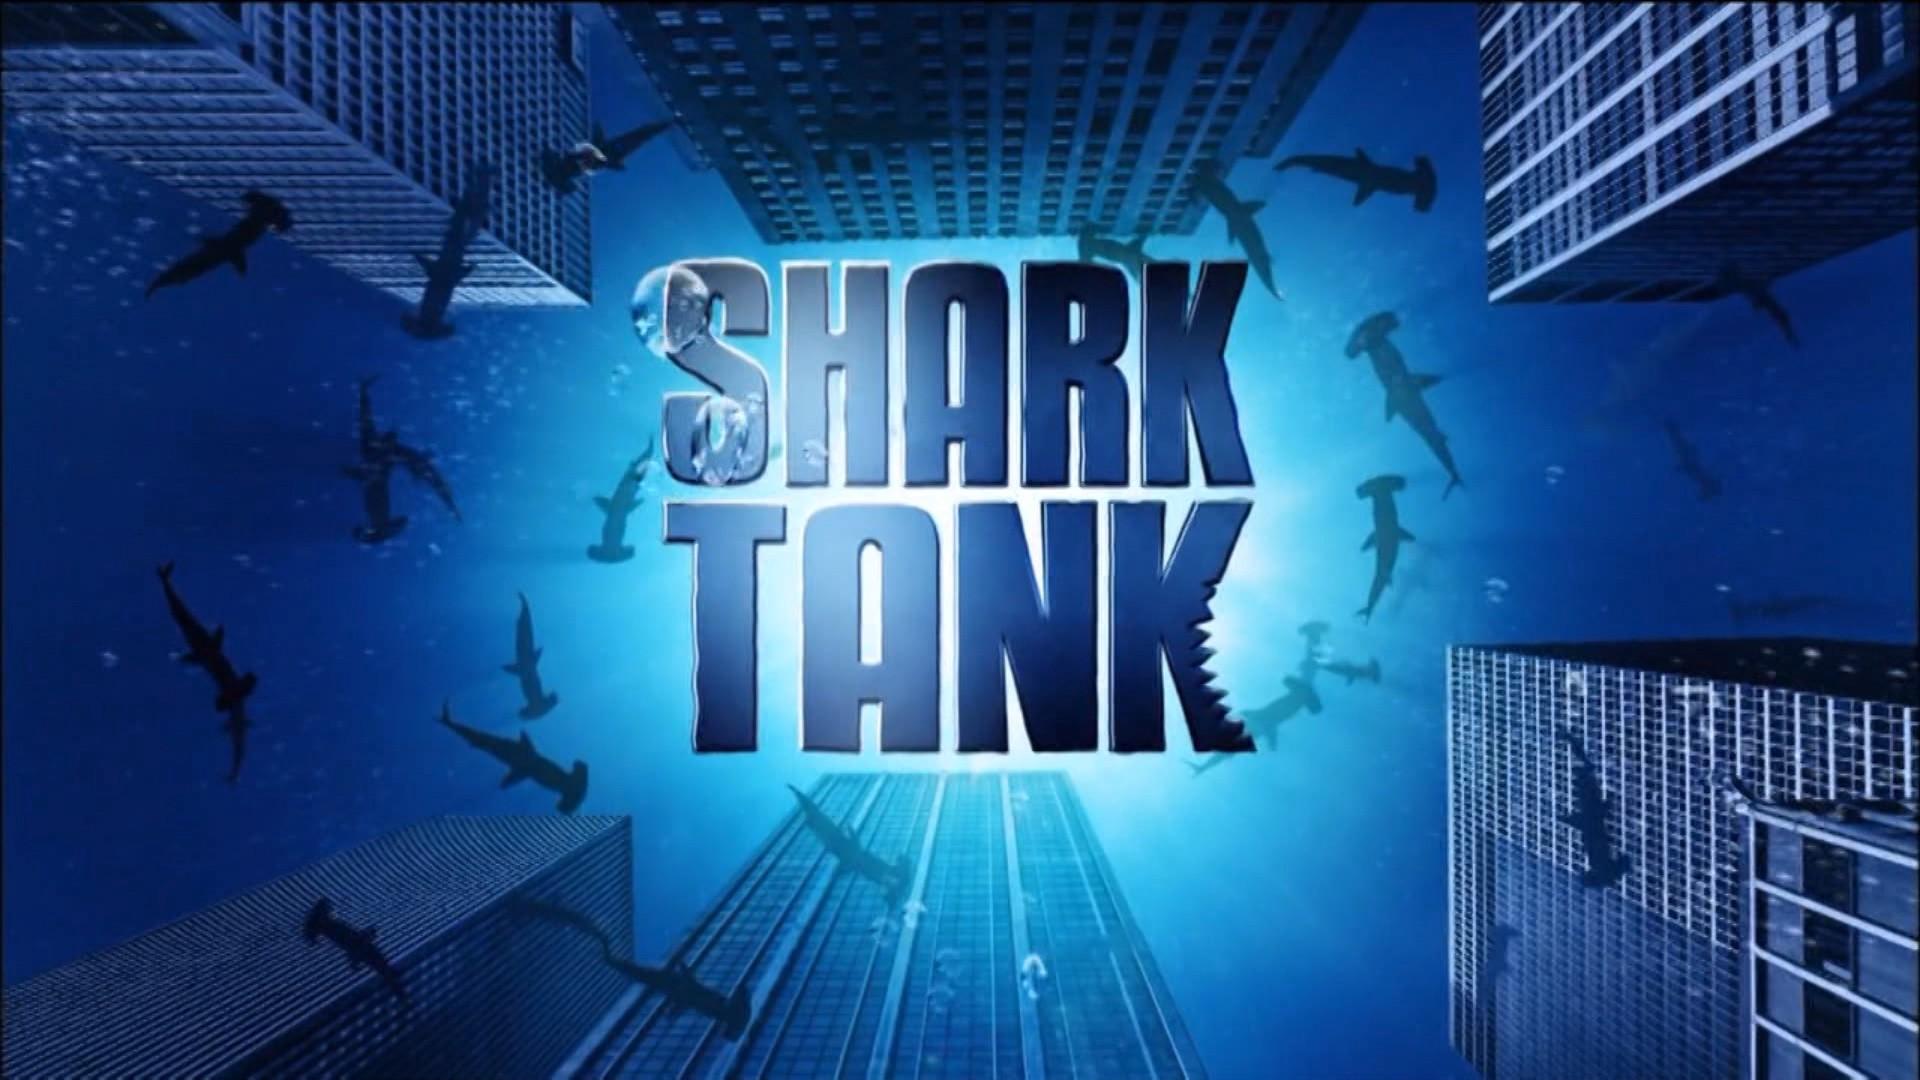 Shark Tank Synopsis